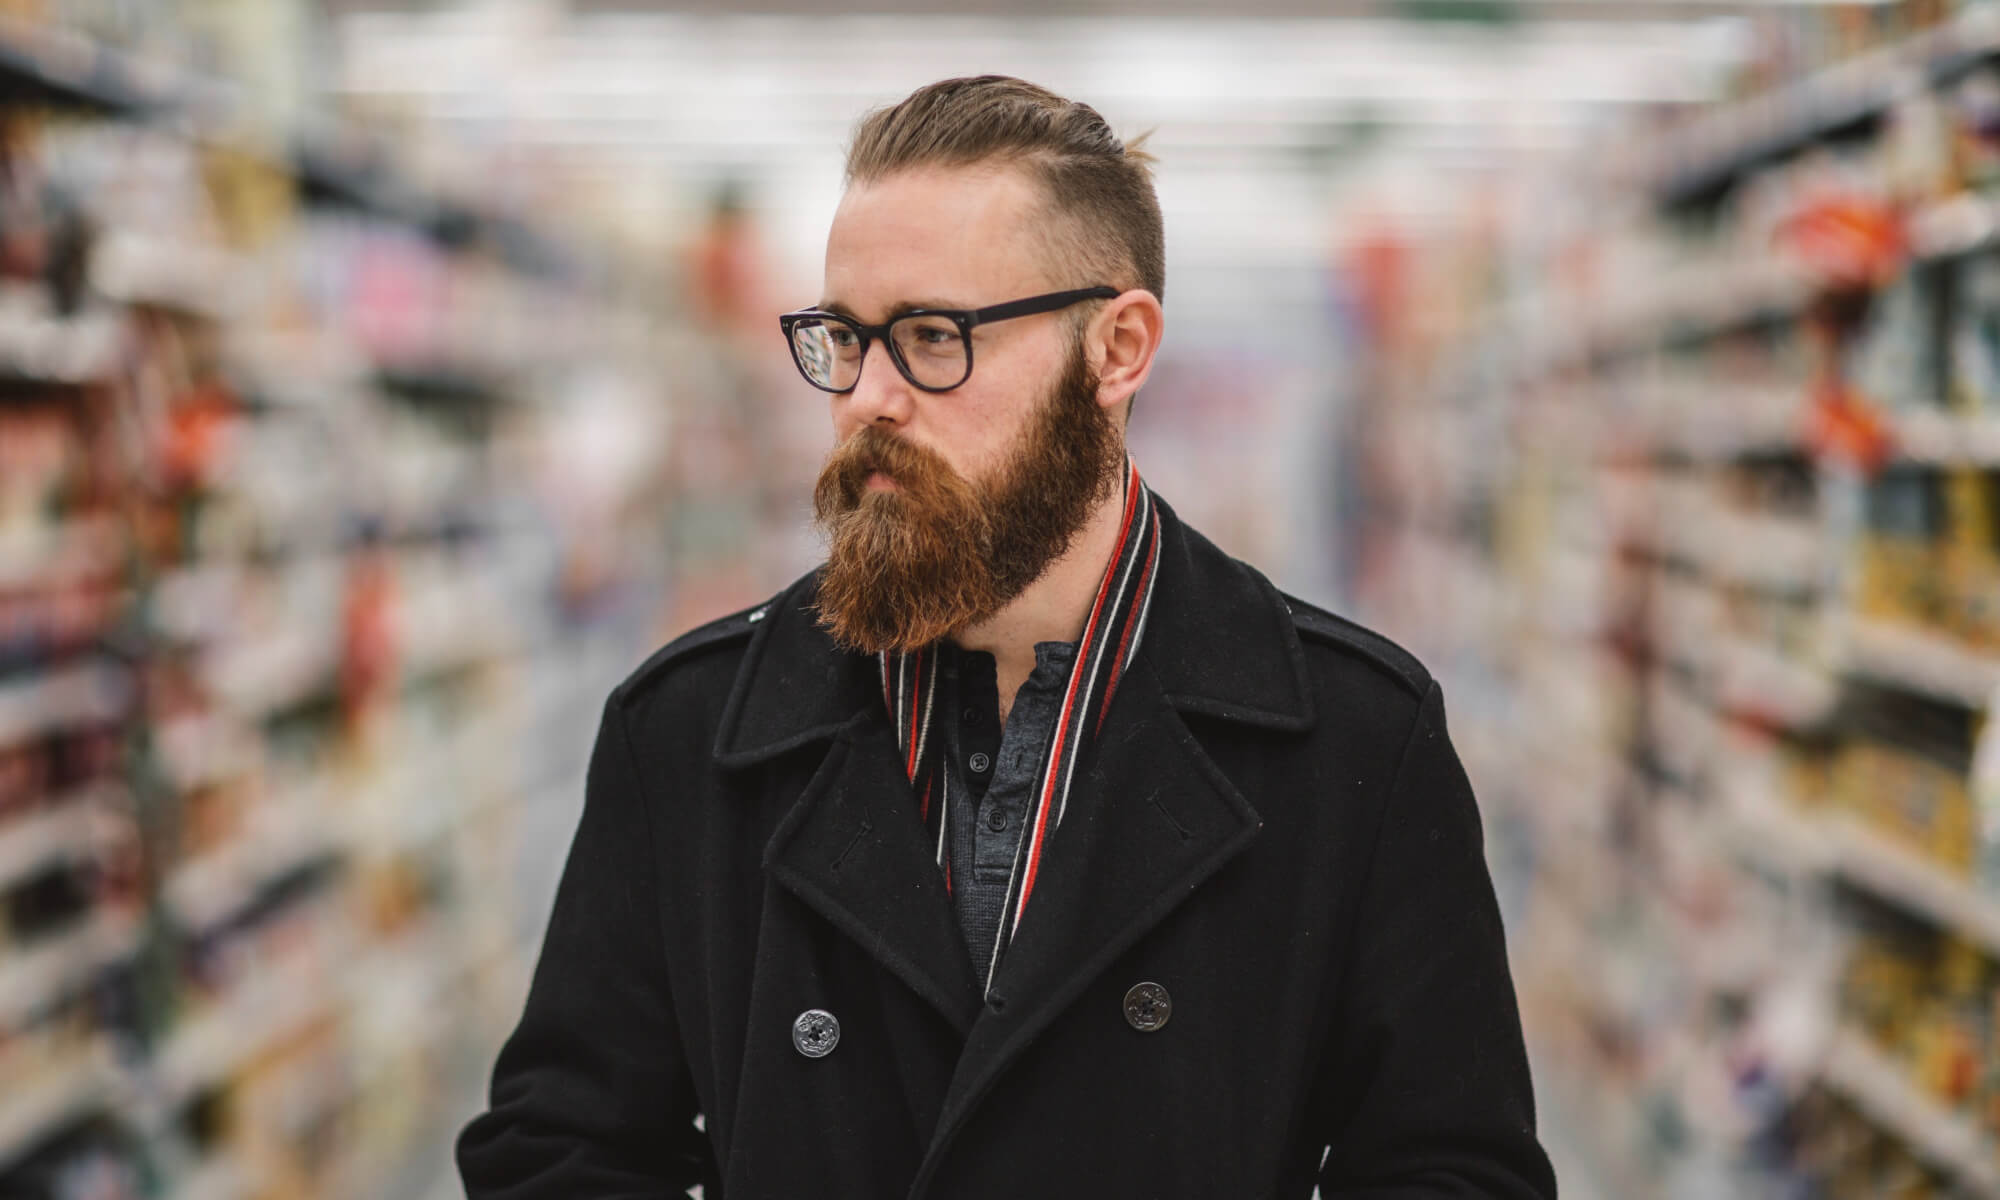 Brooklyn man in grocery store